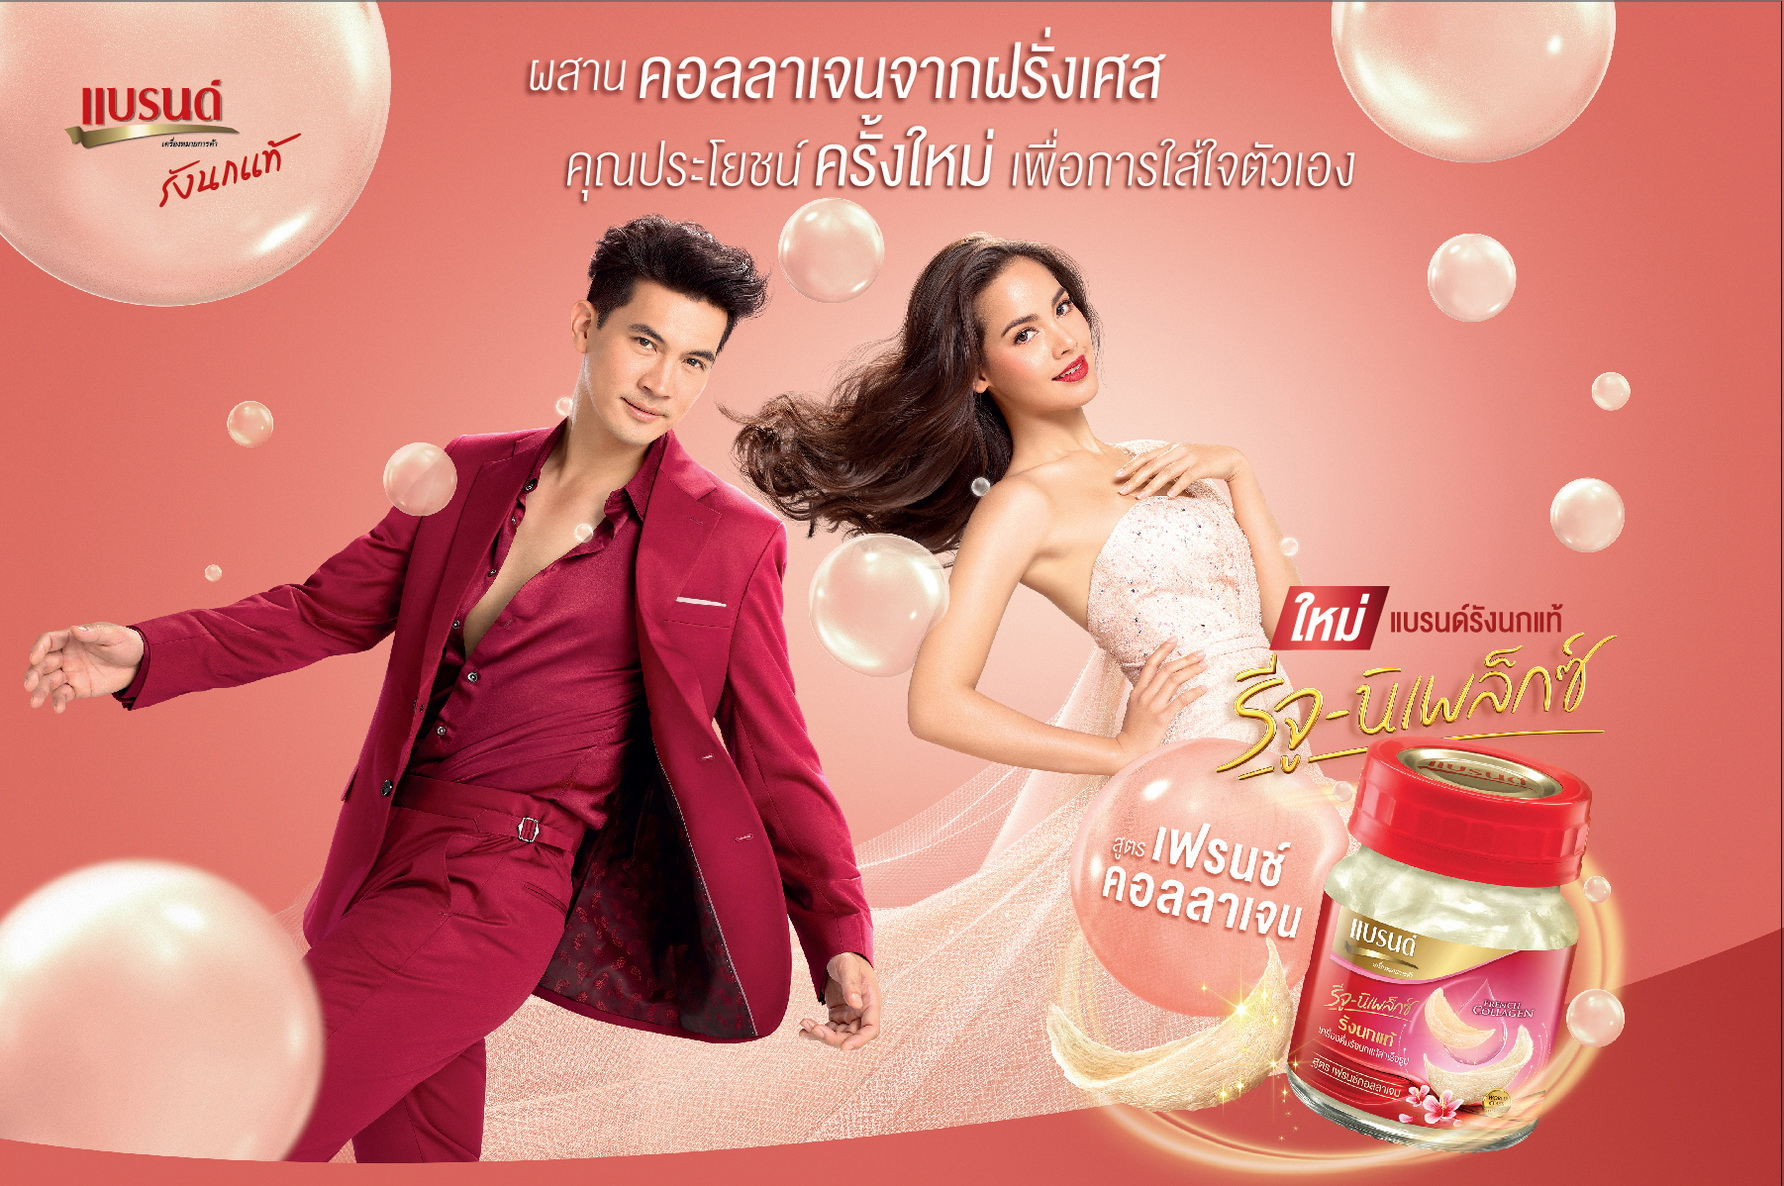 AW_BBN REJU_Ken yaya_120x100cm_Thai_CS6